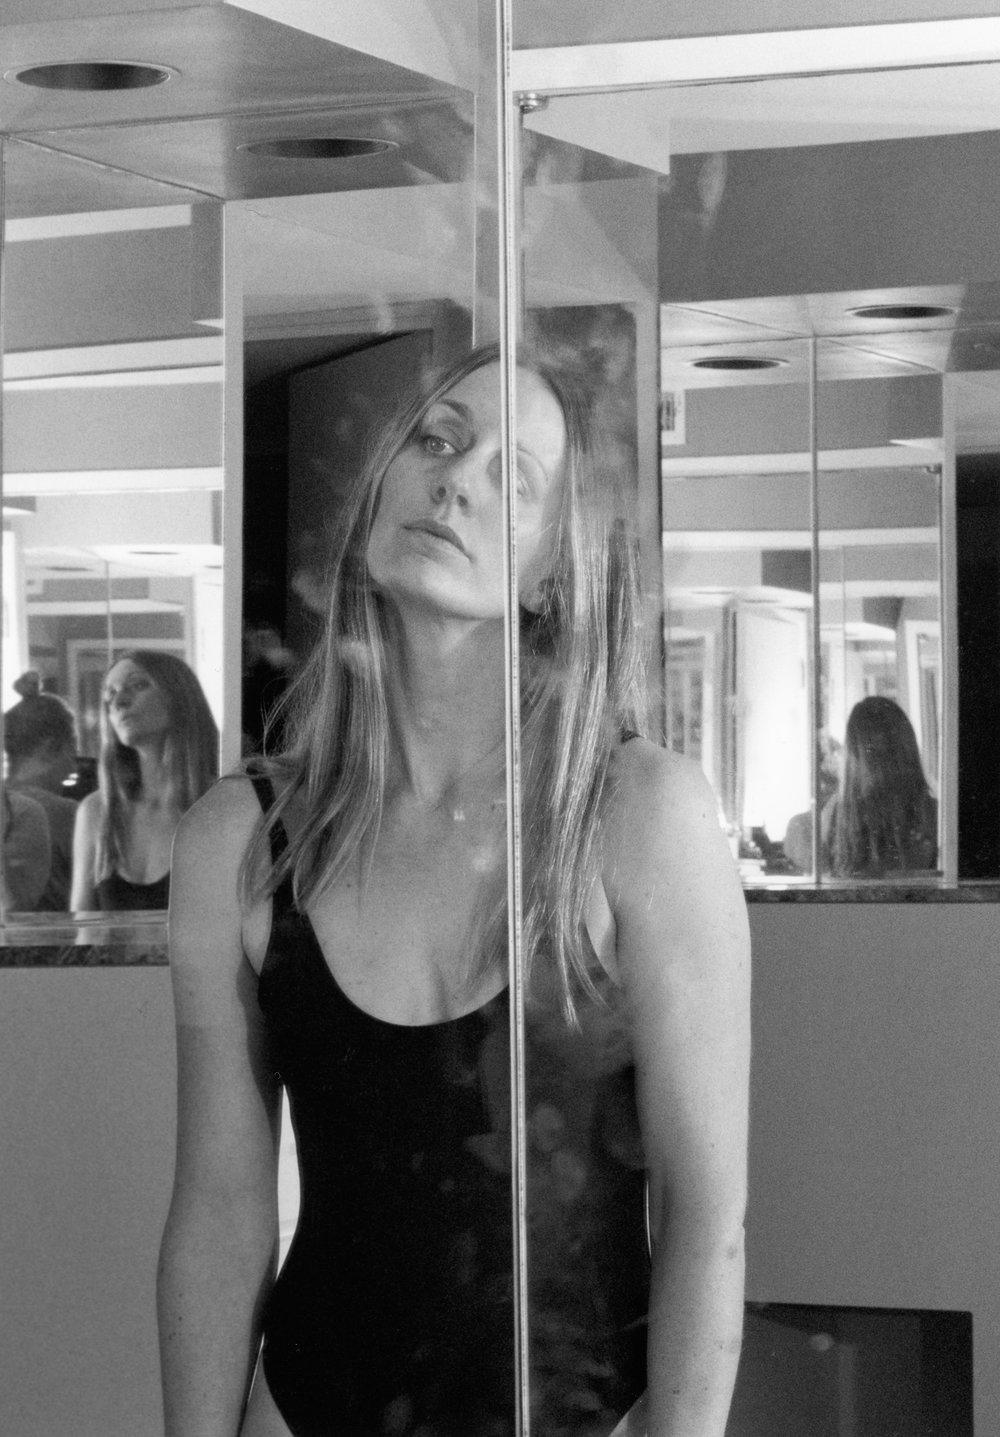 c in mirror223_web.jpg